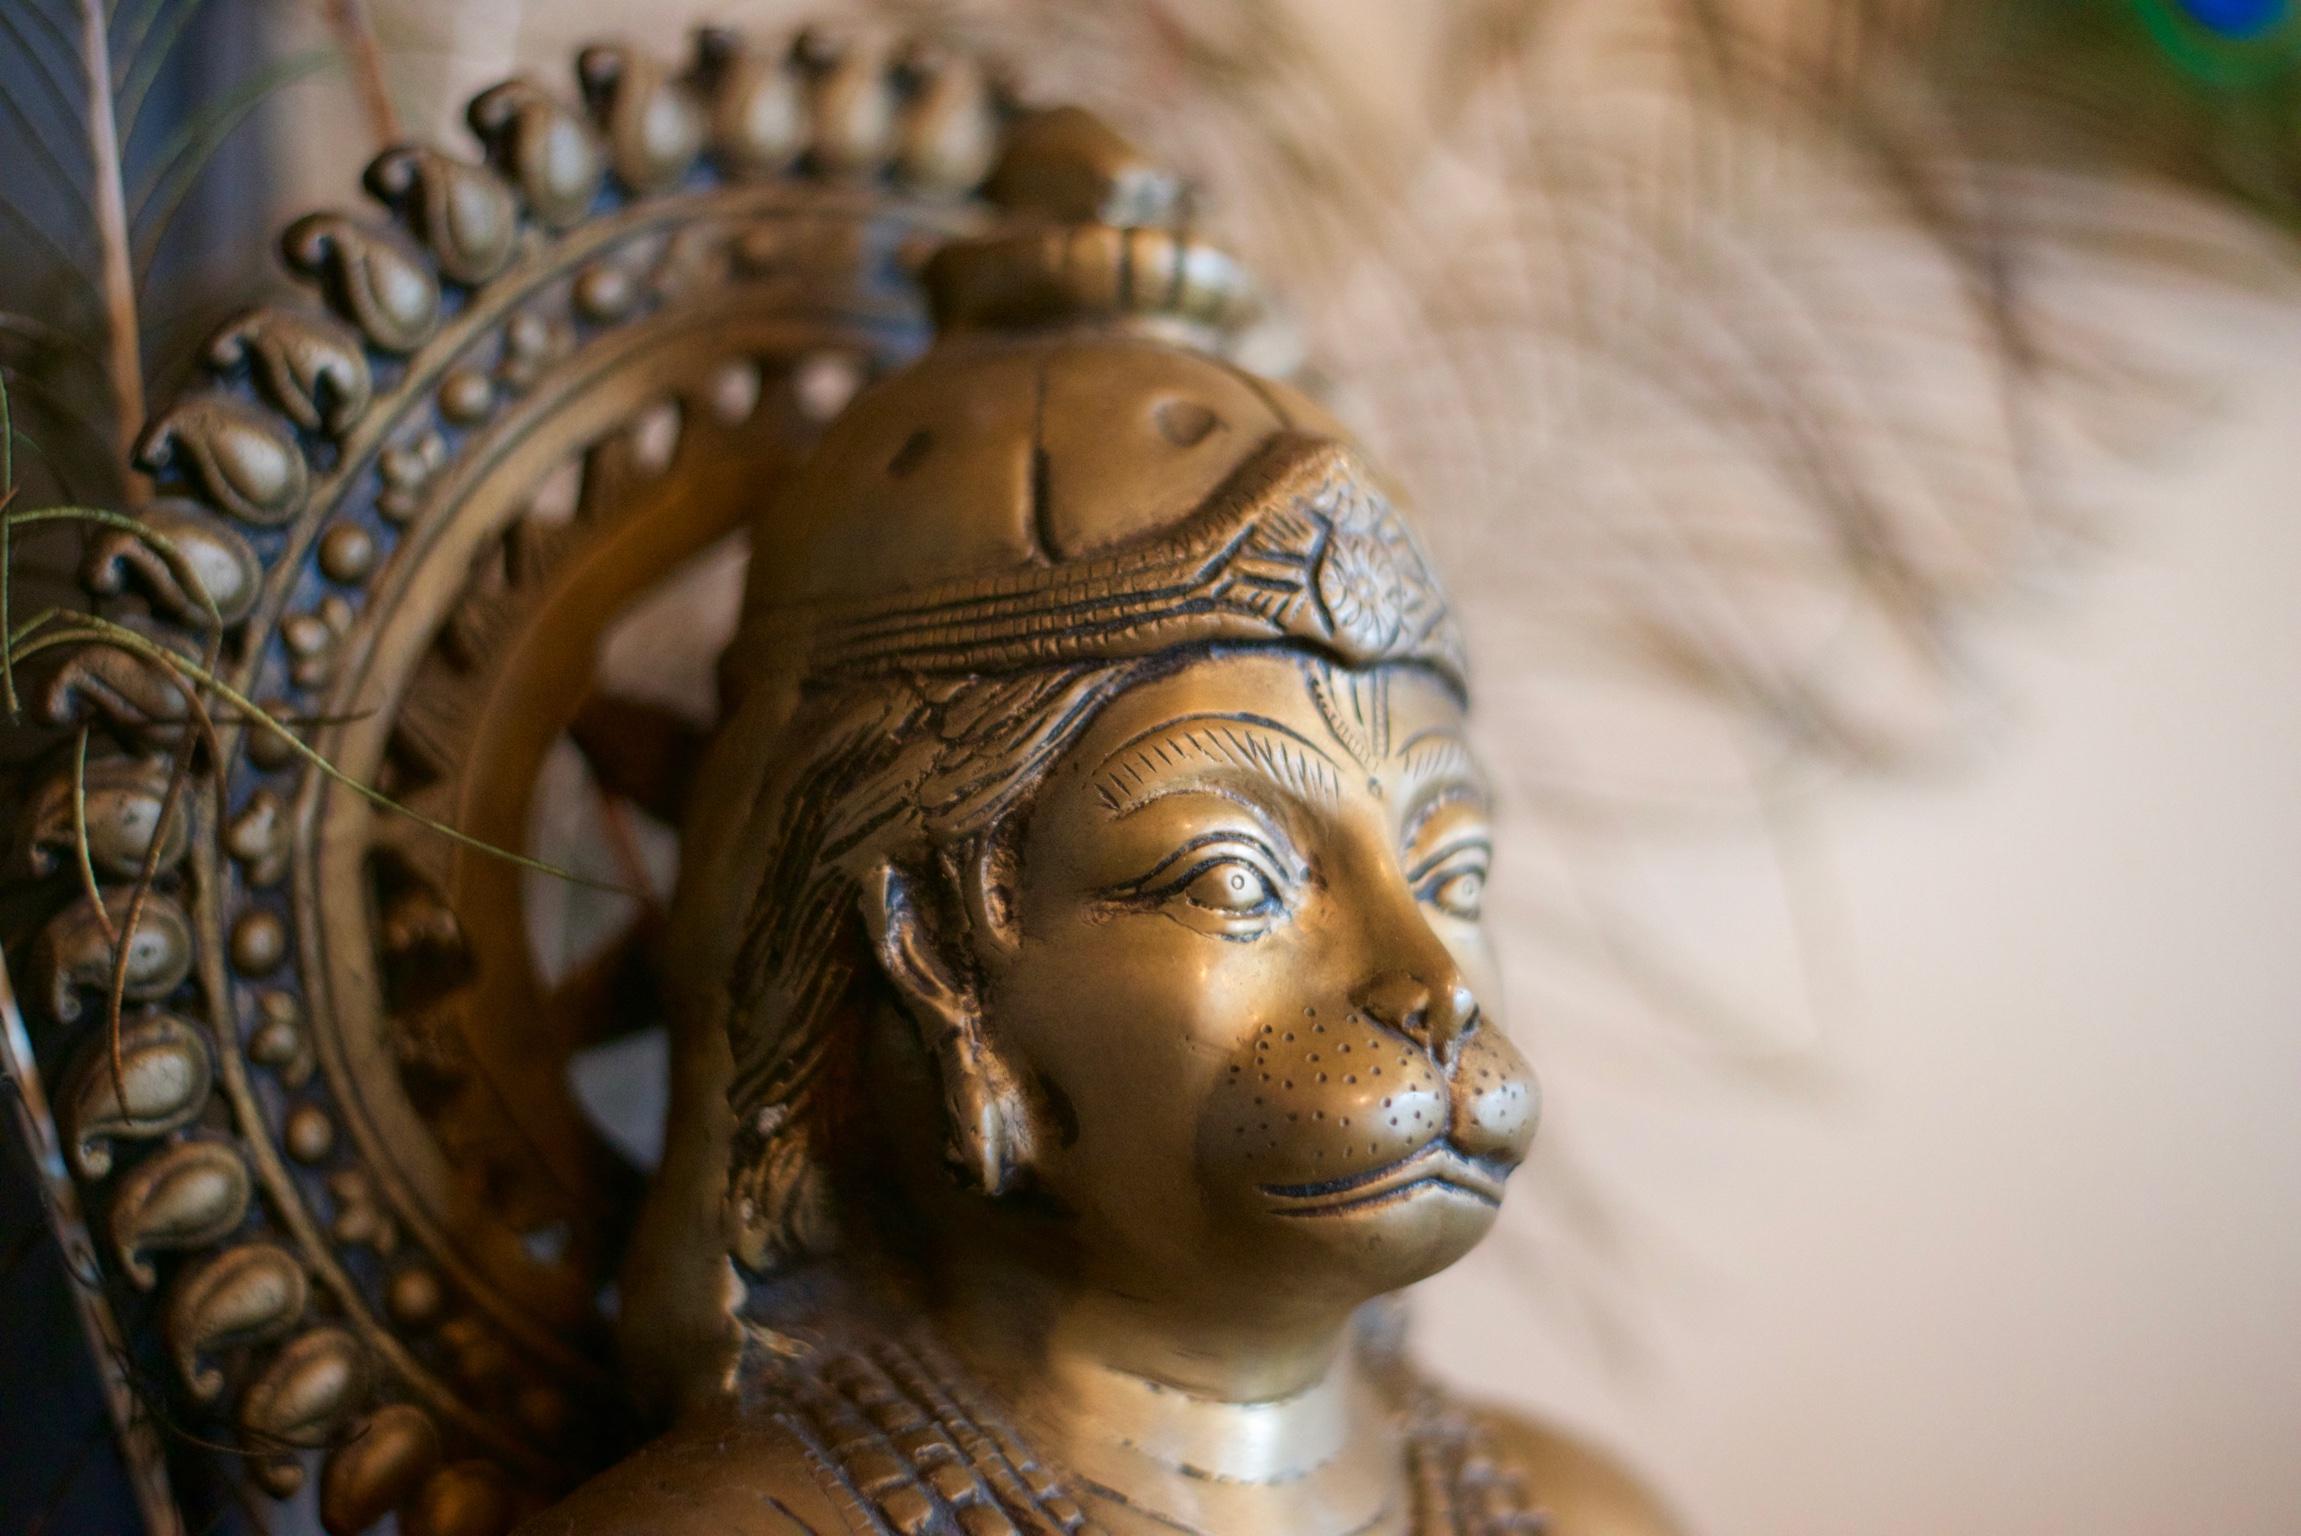 hanuman statue detail.JPG